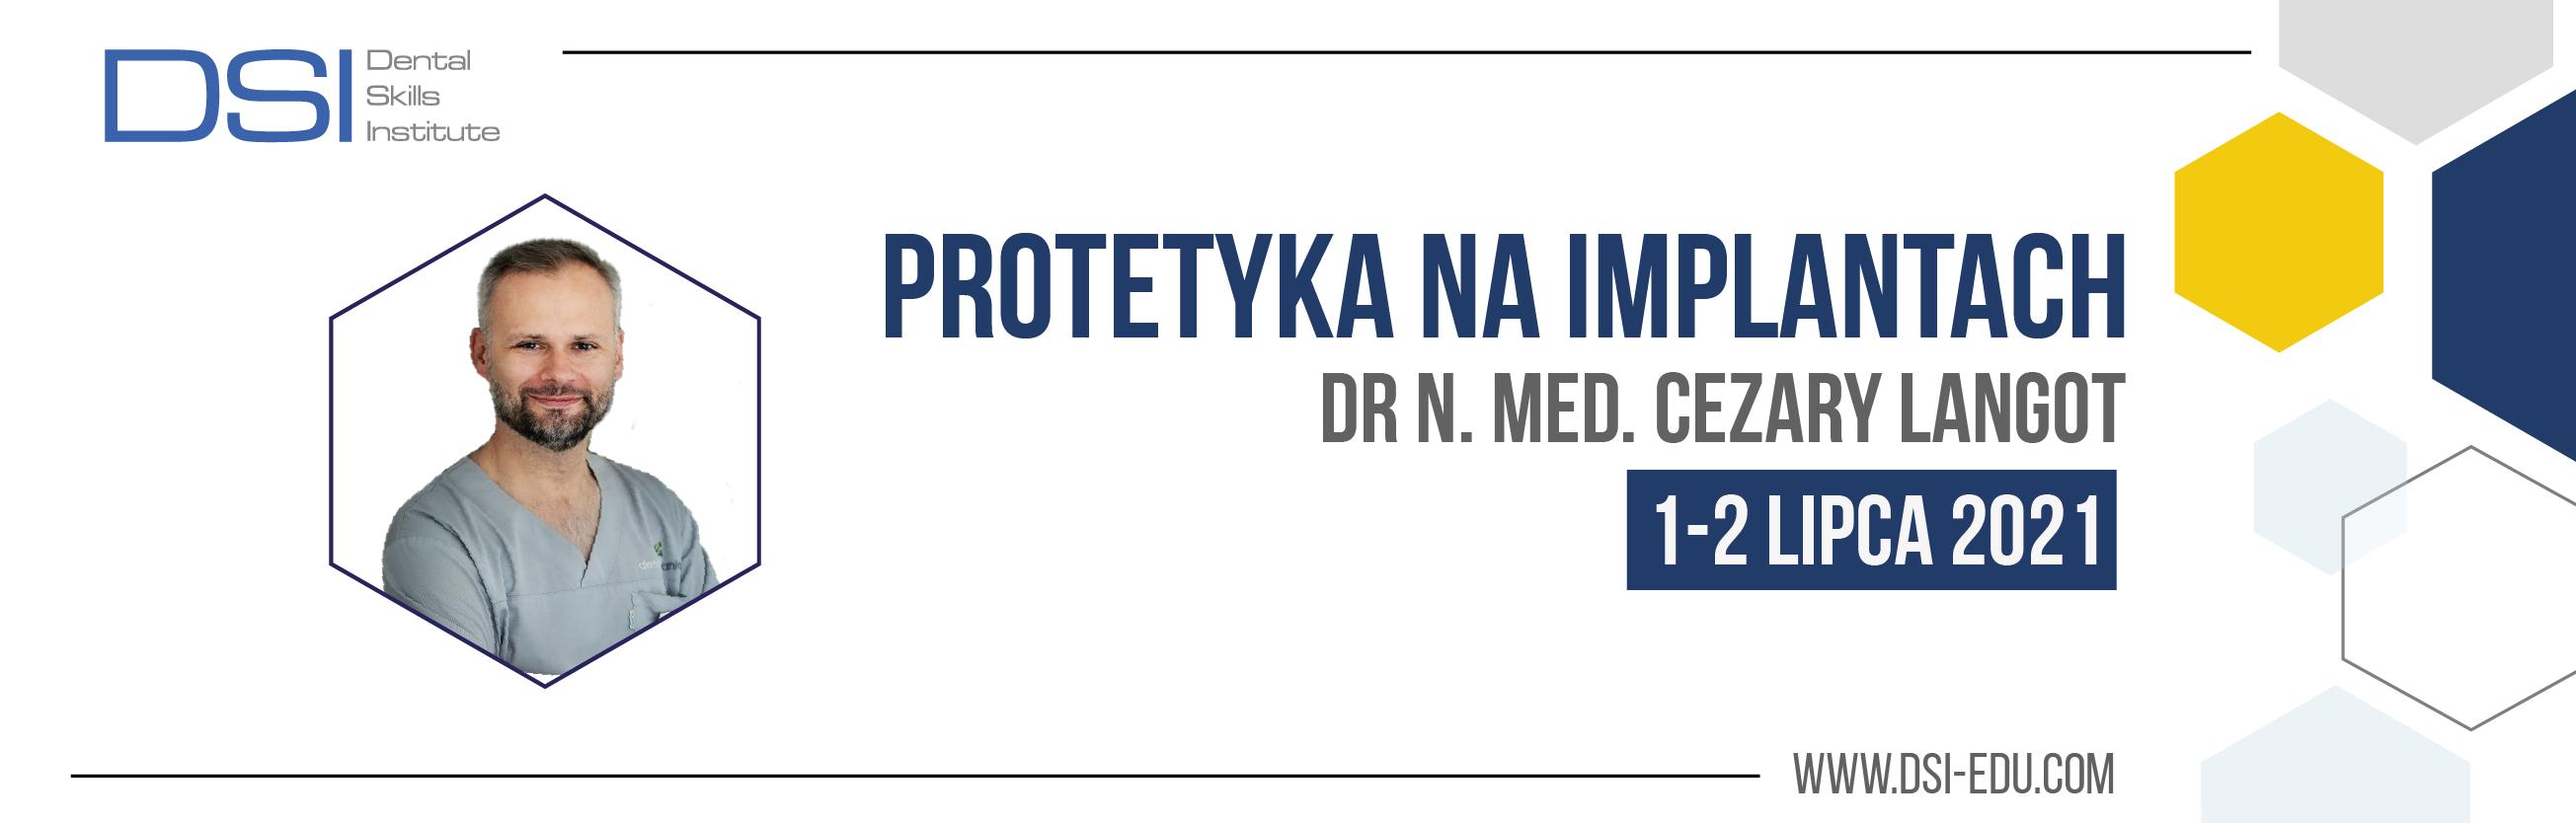 Protetyka na implantach